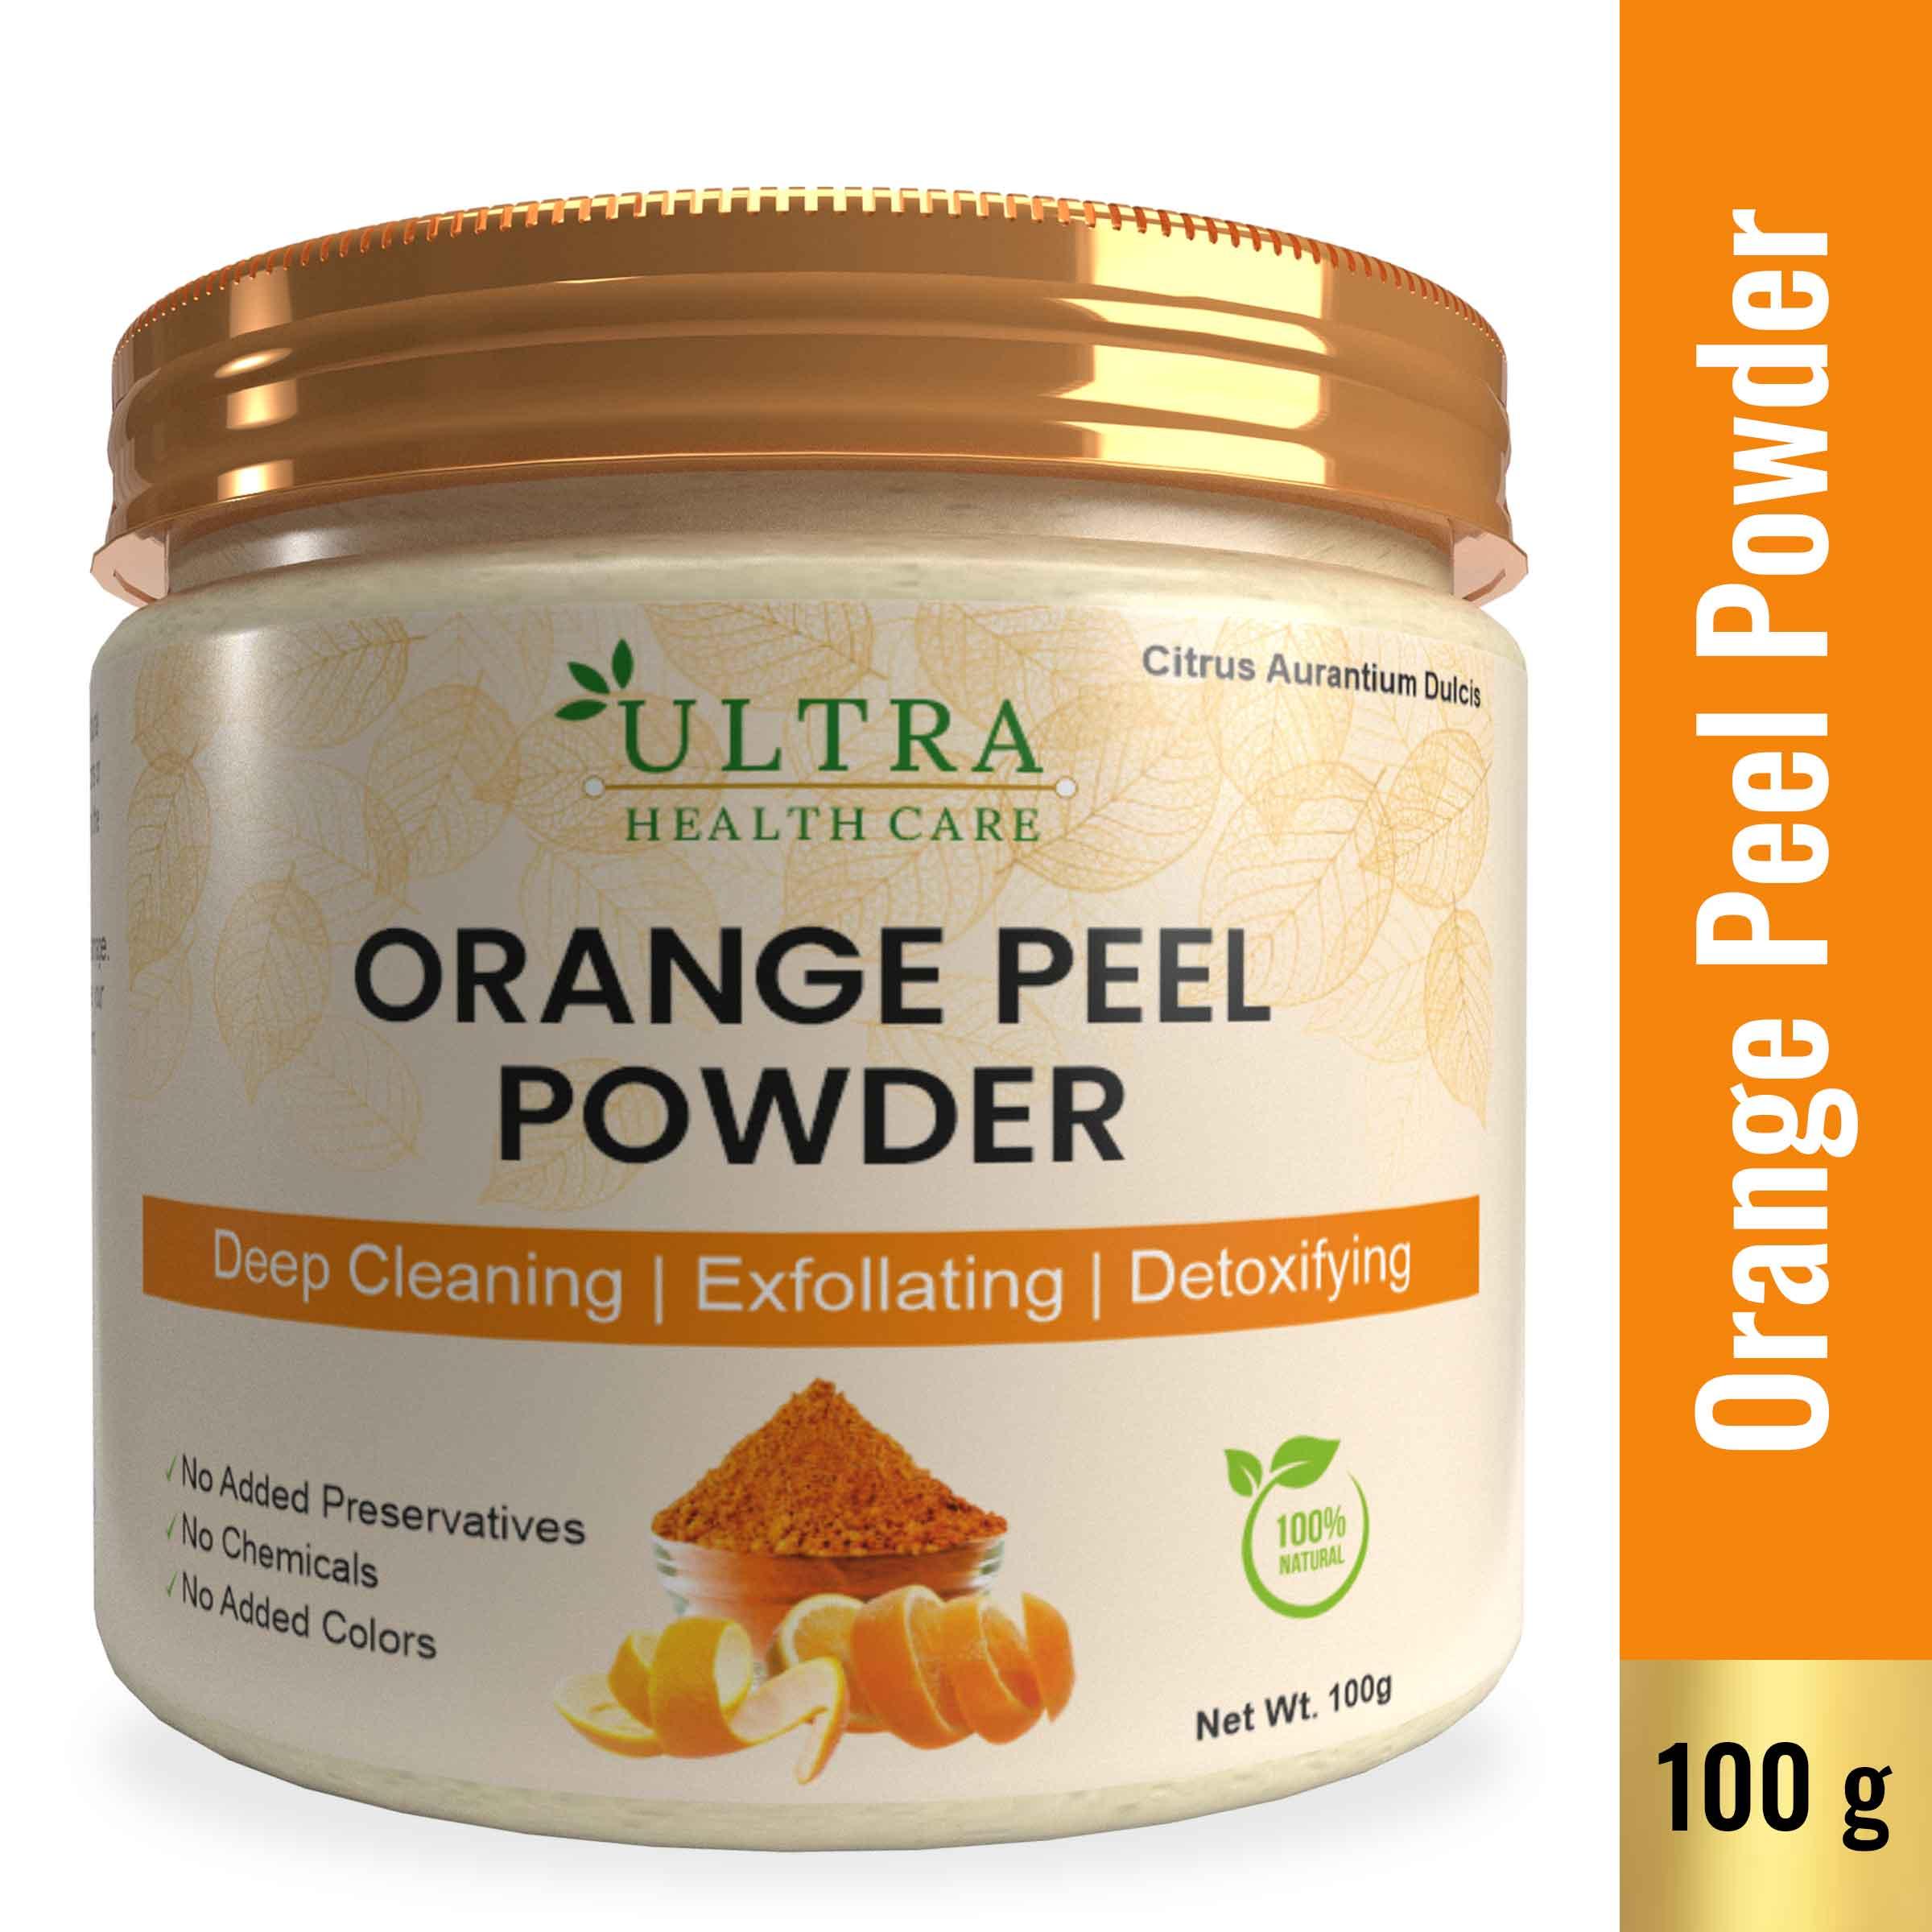 Orange Peel Powder Face Pack